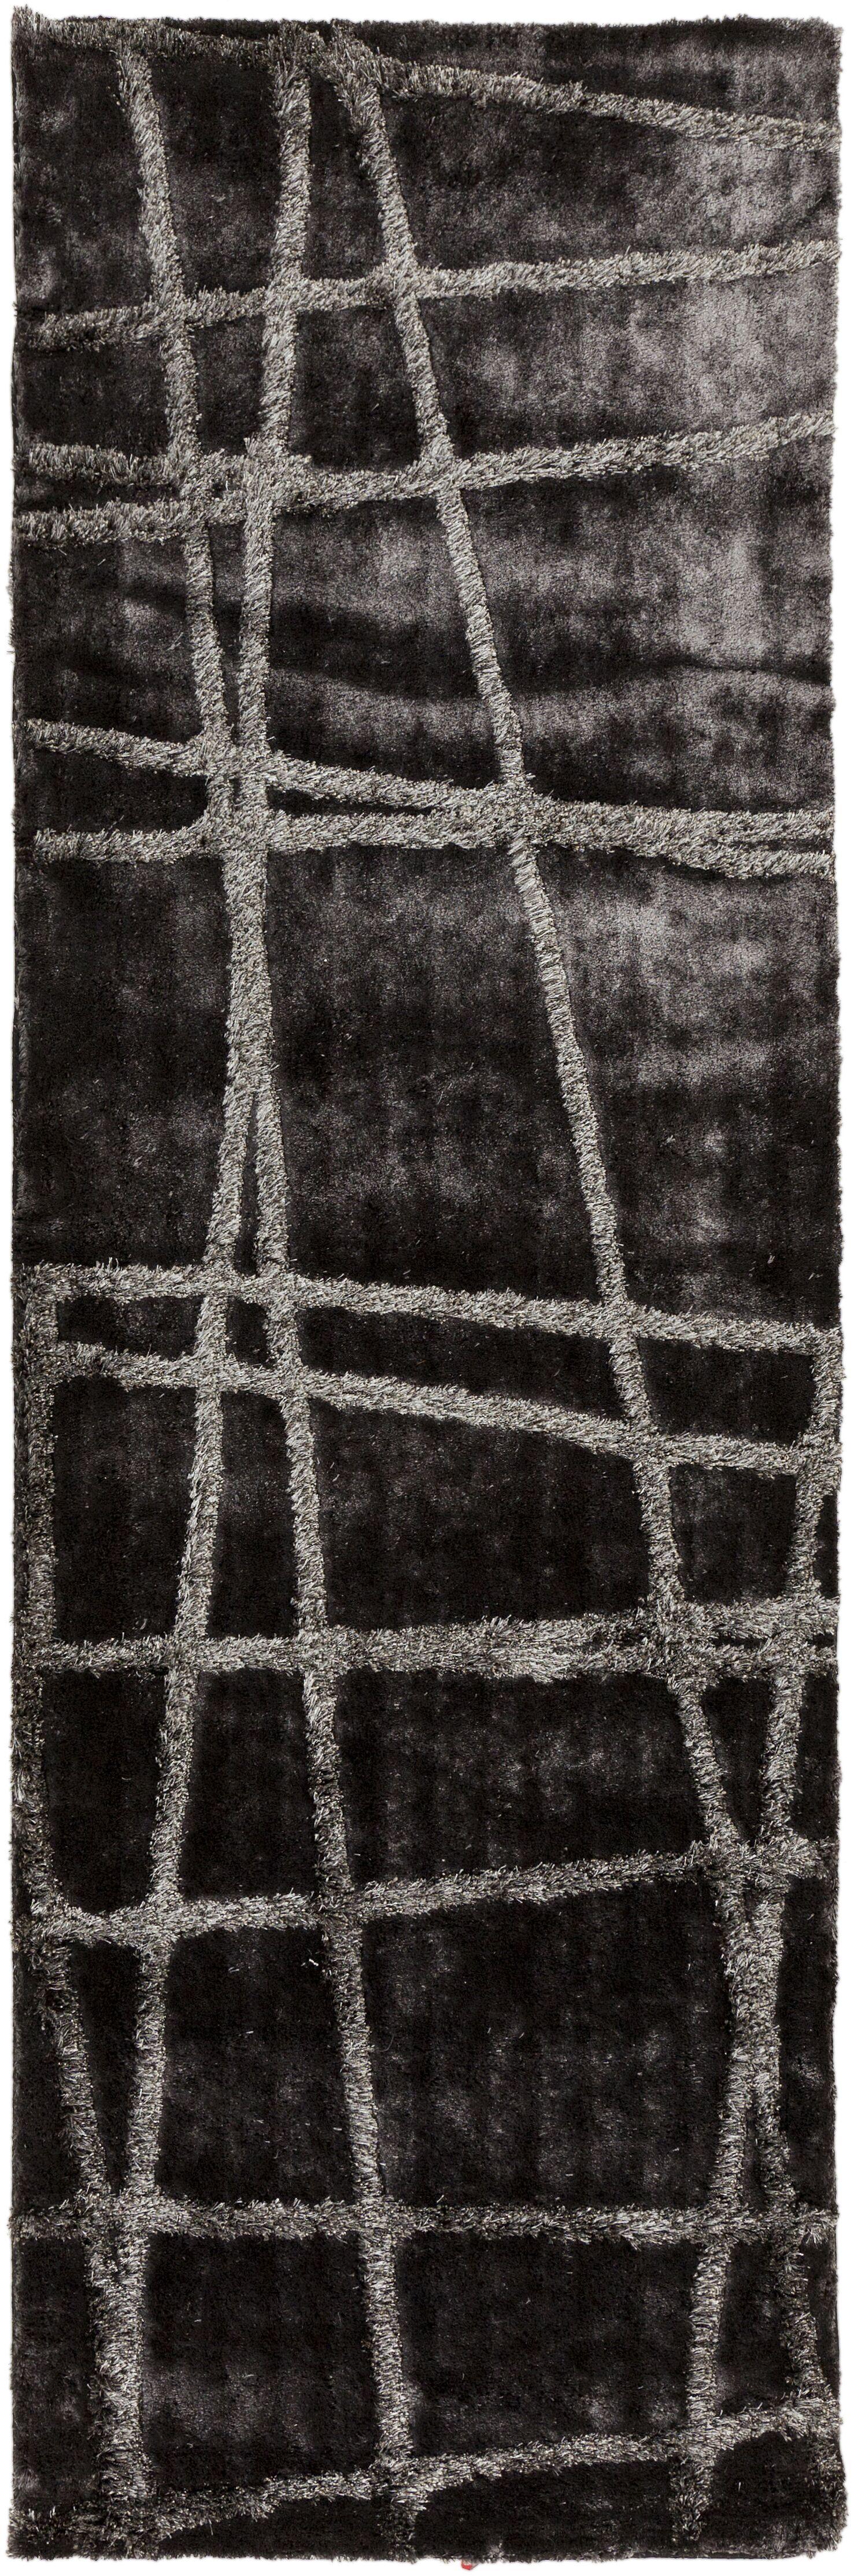 Halterman Pewter/Gray Geometric Area Rug Rug Size: Rectangle 5' x 8'